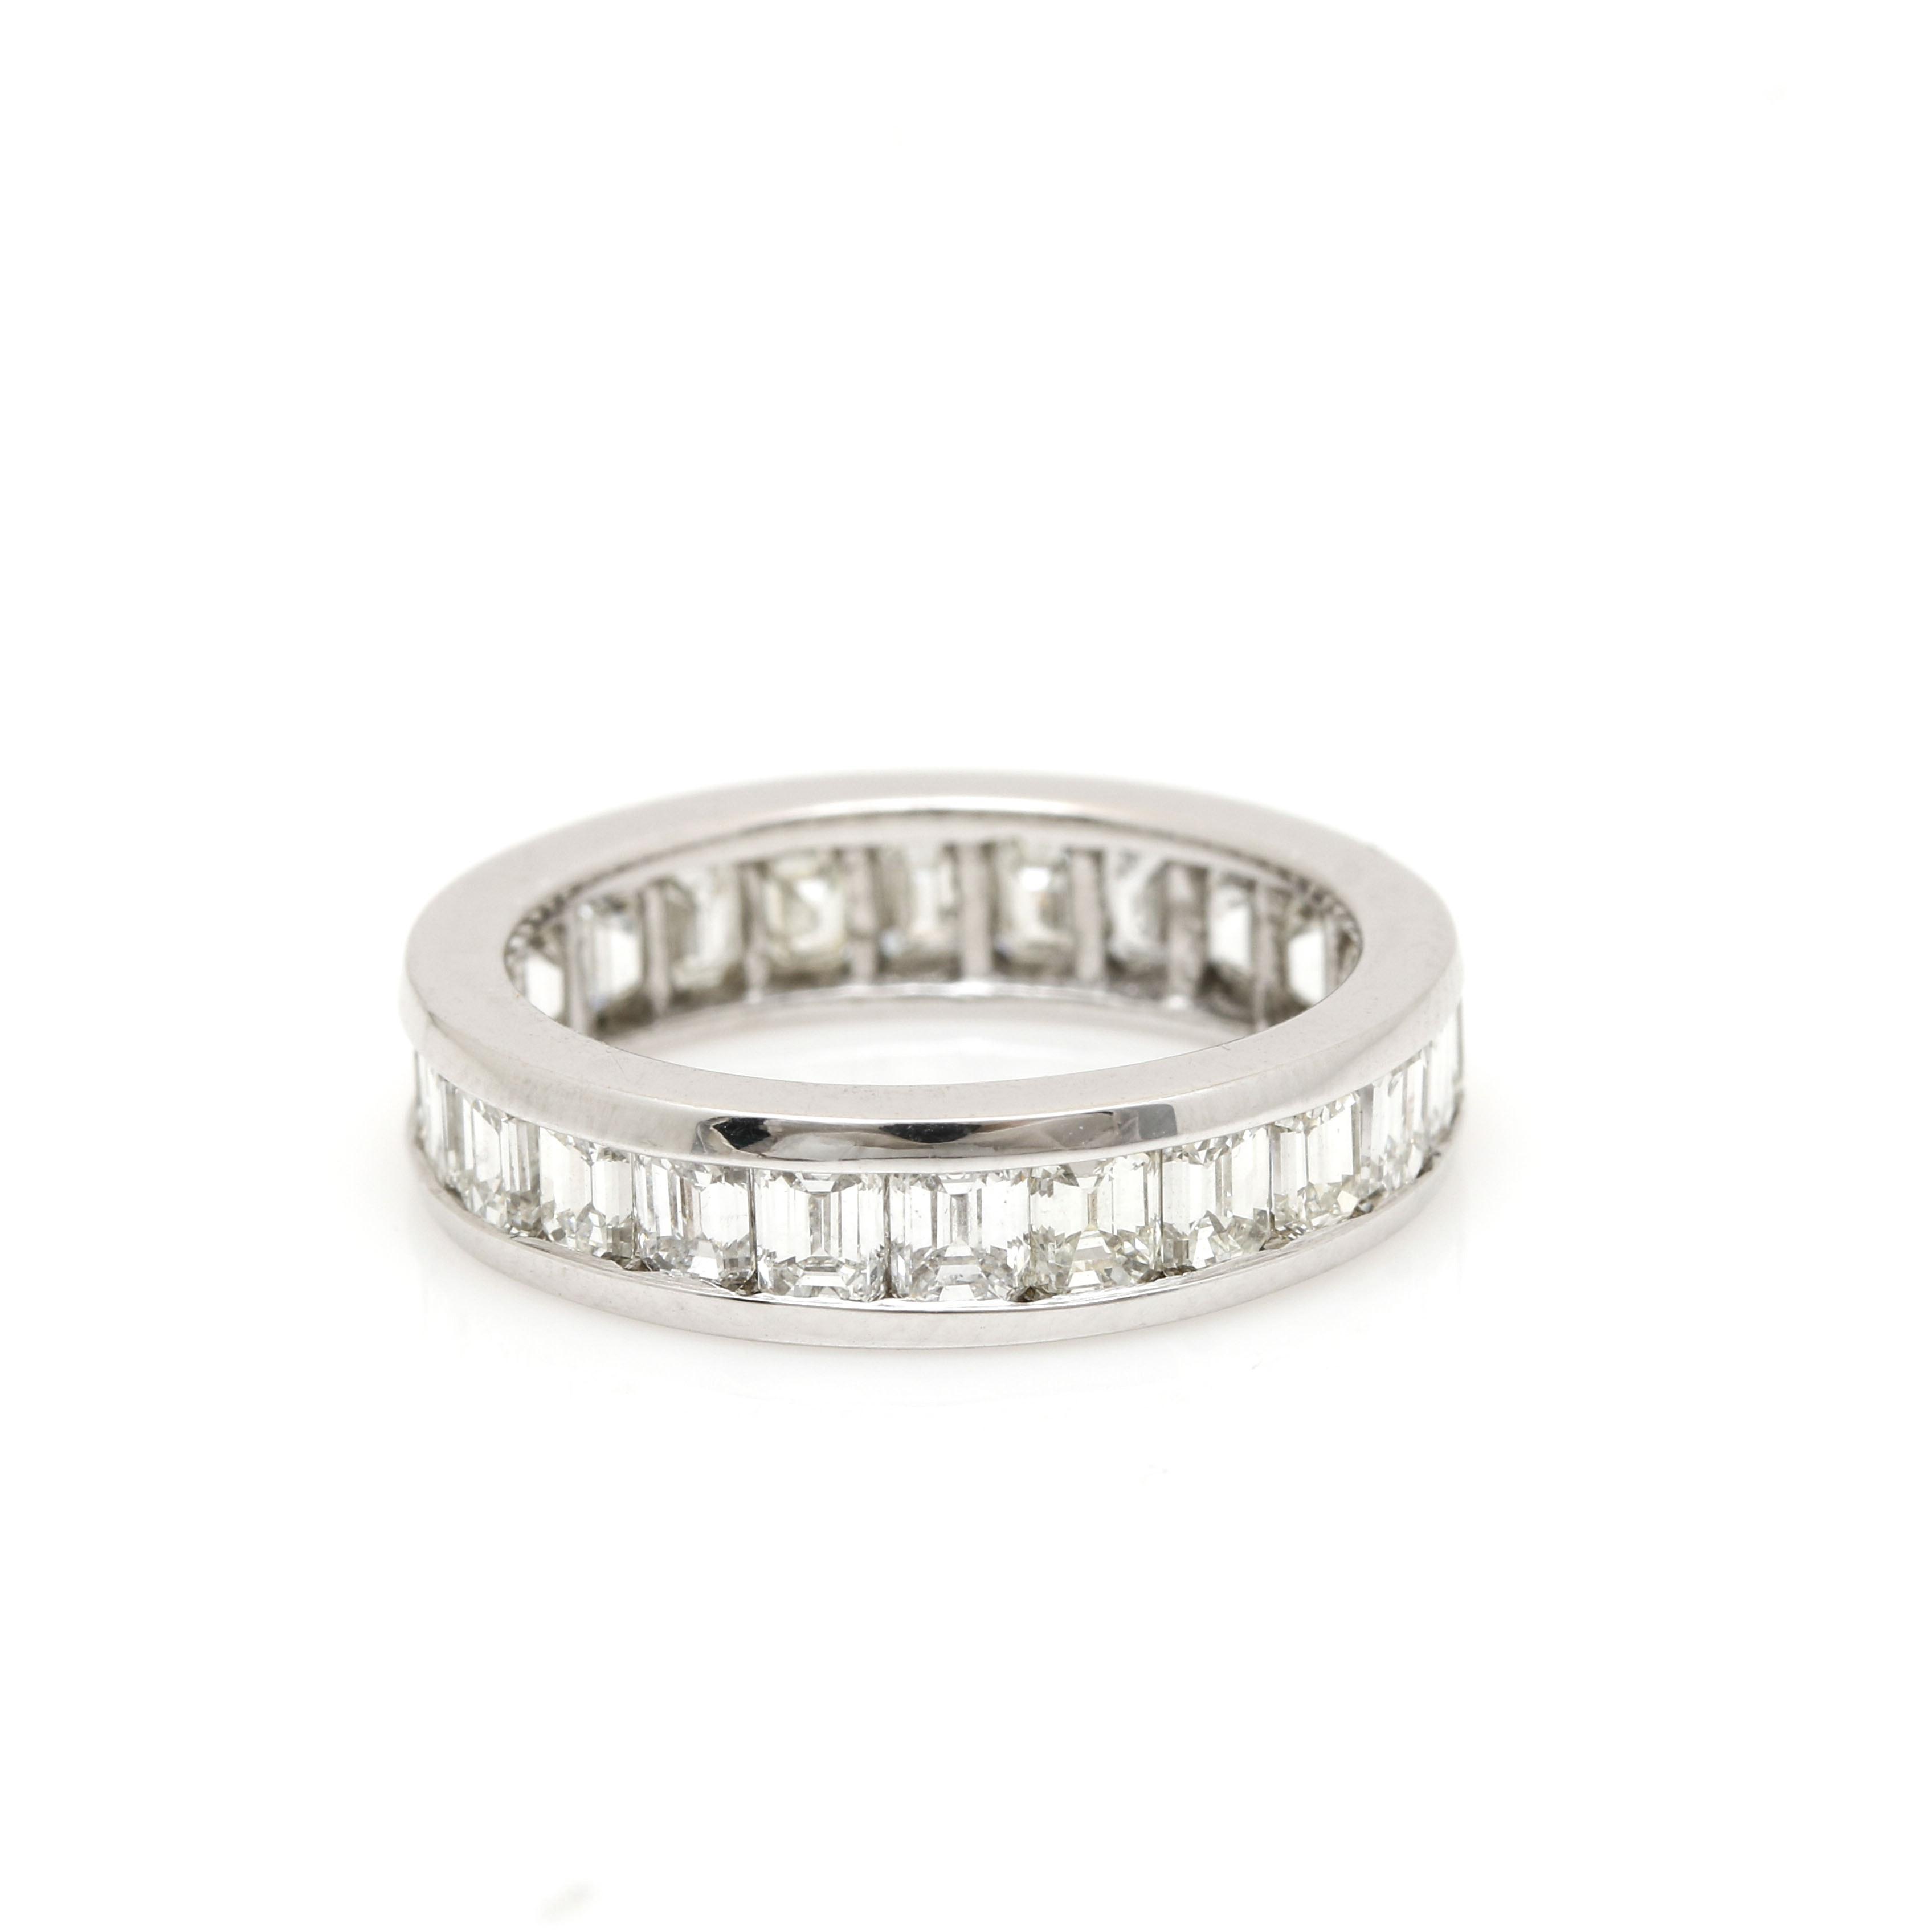 14K White Gold 2.98 CTW Diamond Eternity Ring